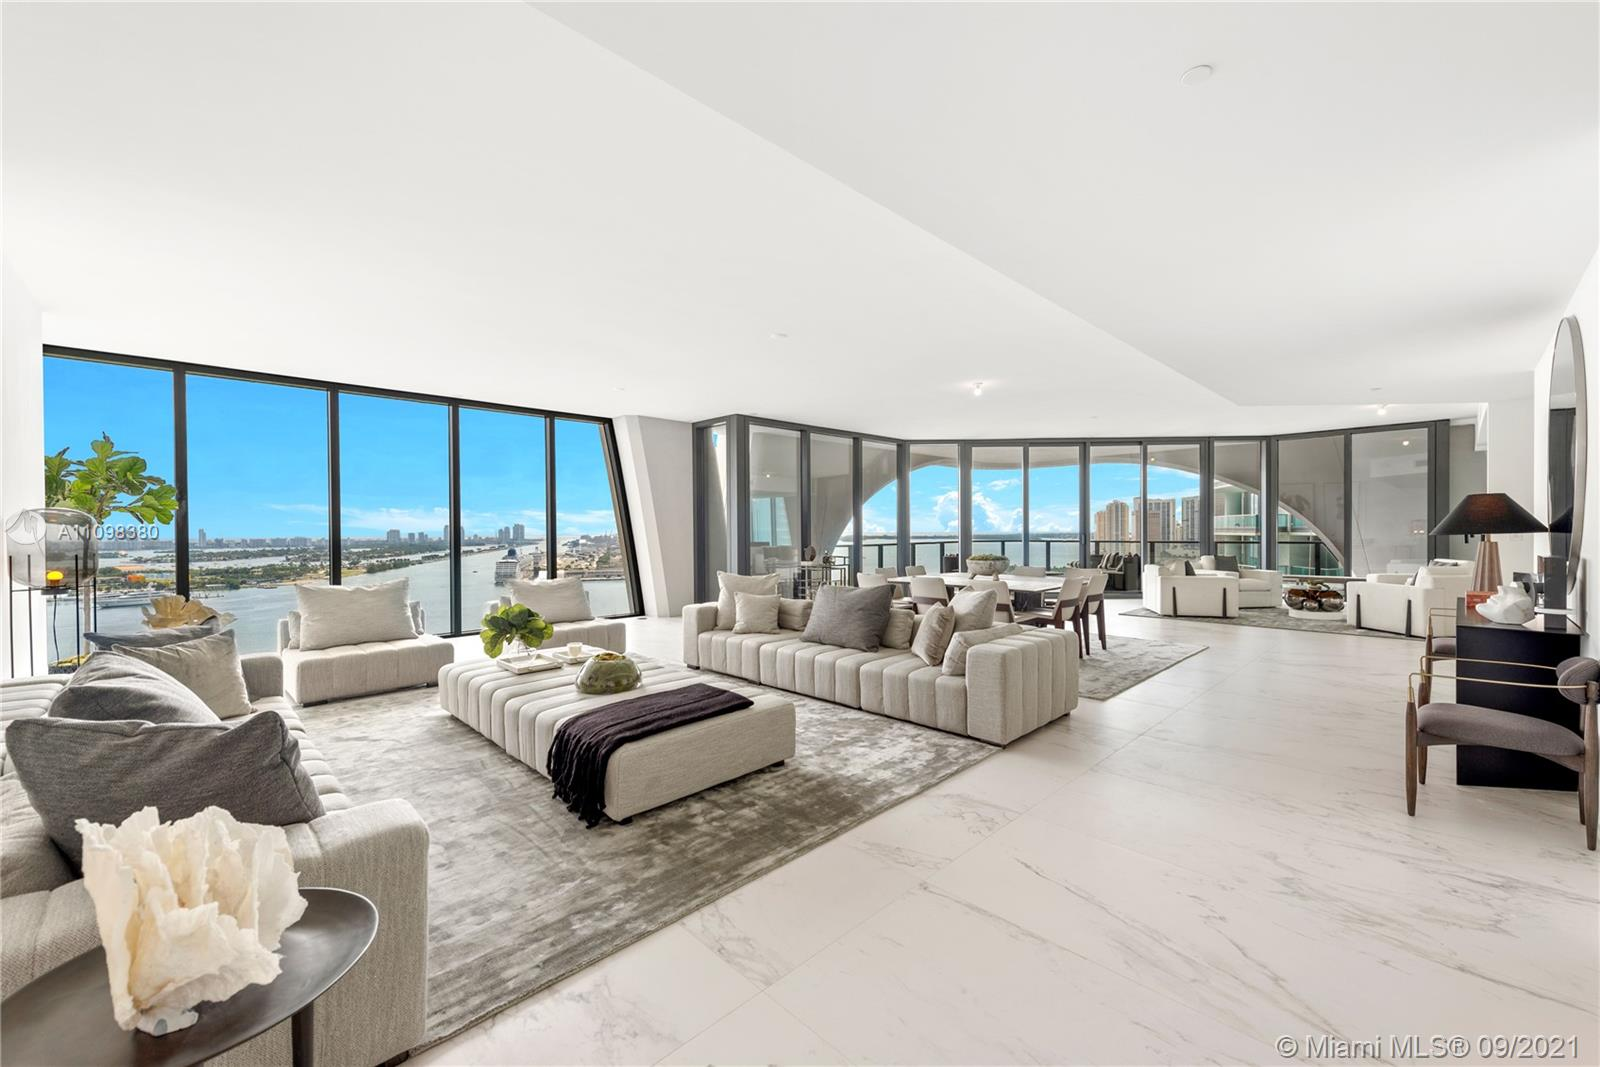 1000 Biscayne Blvd, Unit #2401 Luxury Real Estate